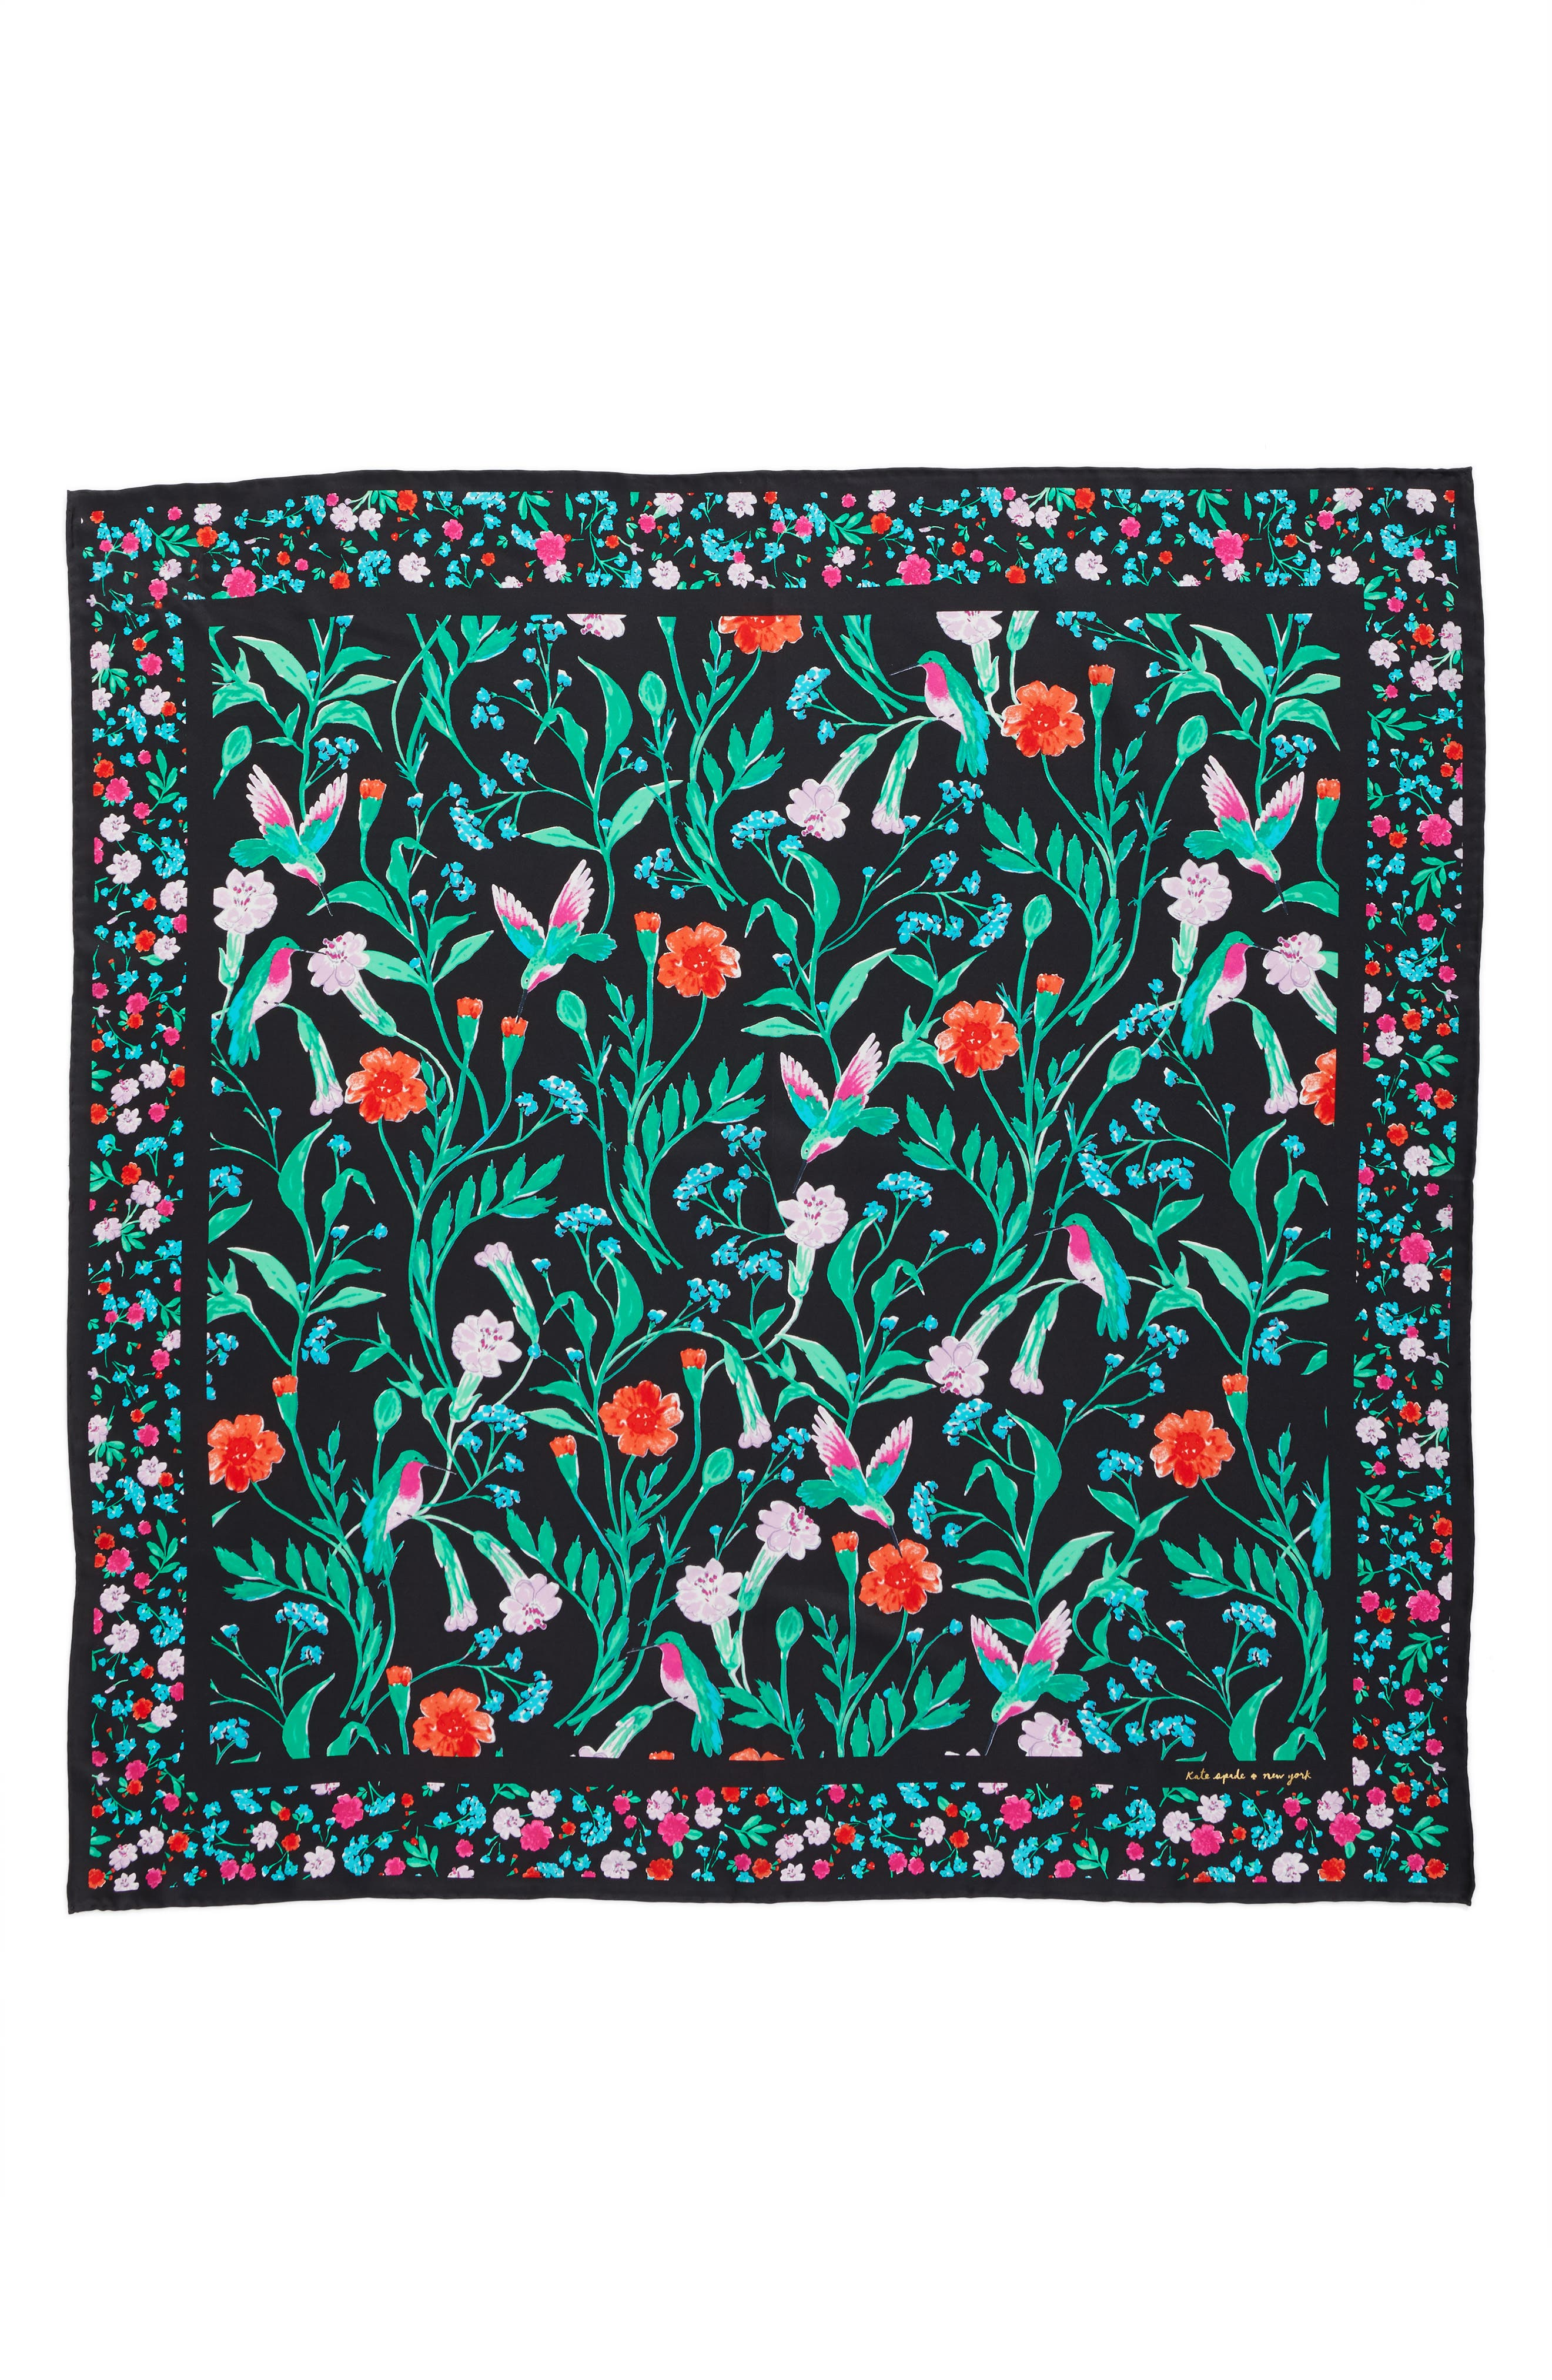 KATE SPADE NEW YORK,                             jardin silk square scarf,                             Alternate thumbnail 2, color,                             001